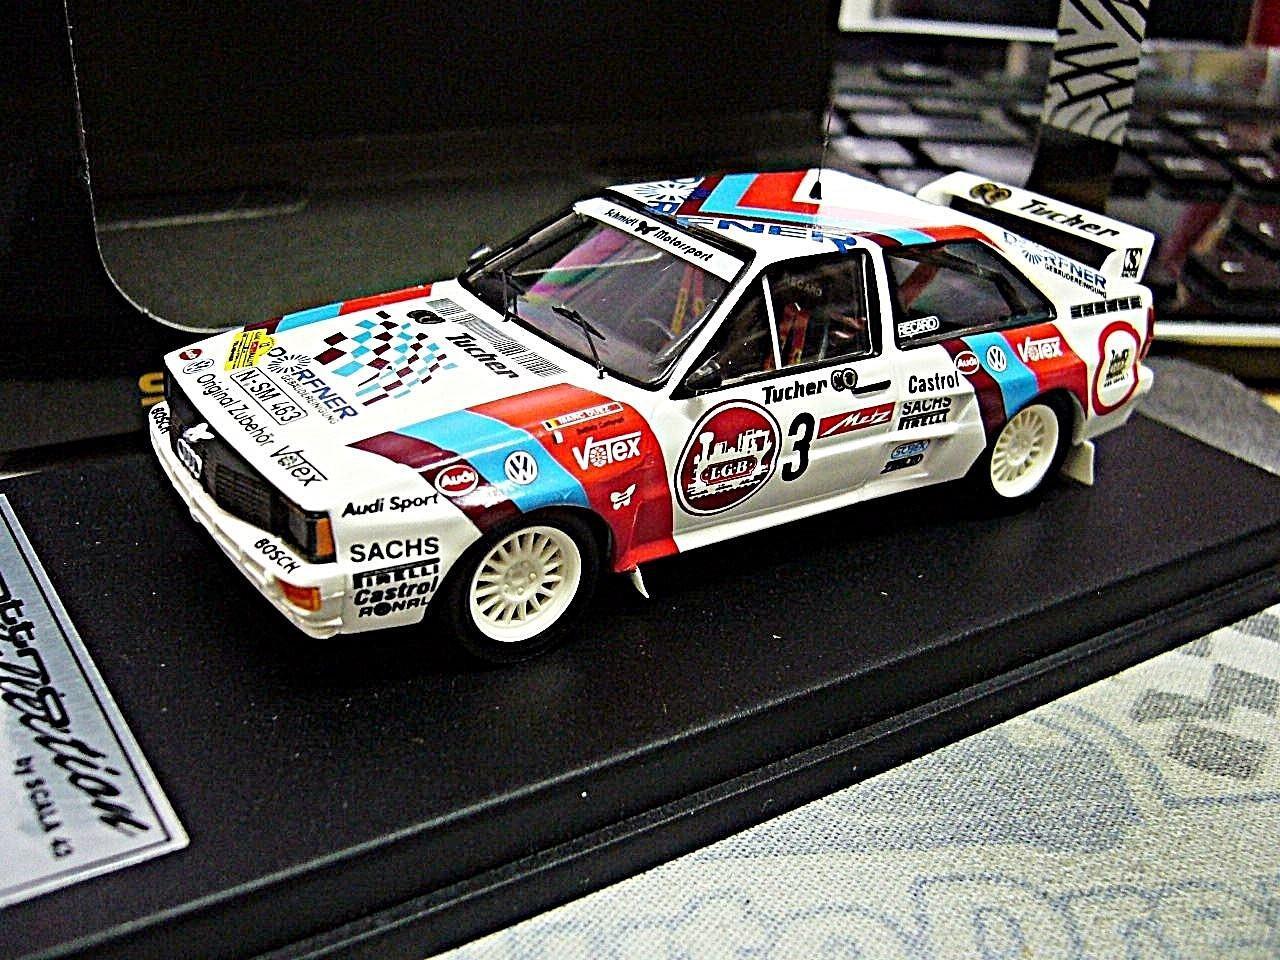 AUDI quattro rallye Duez Metz rallye 1985 sms DRM Limited 1 250 scala 43 1 43